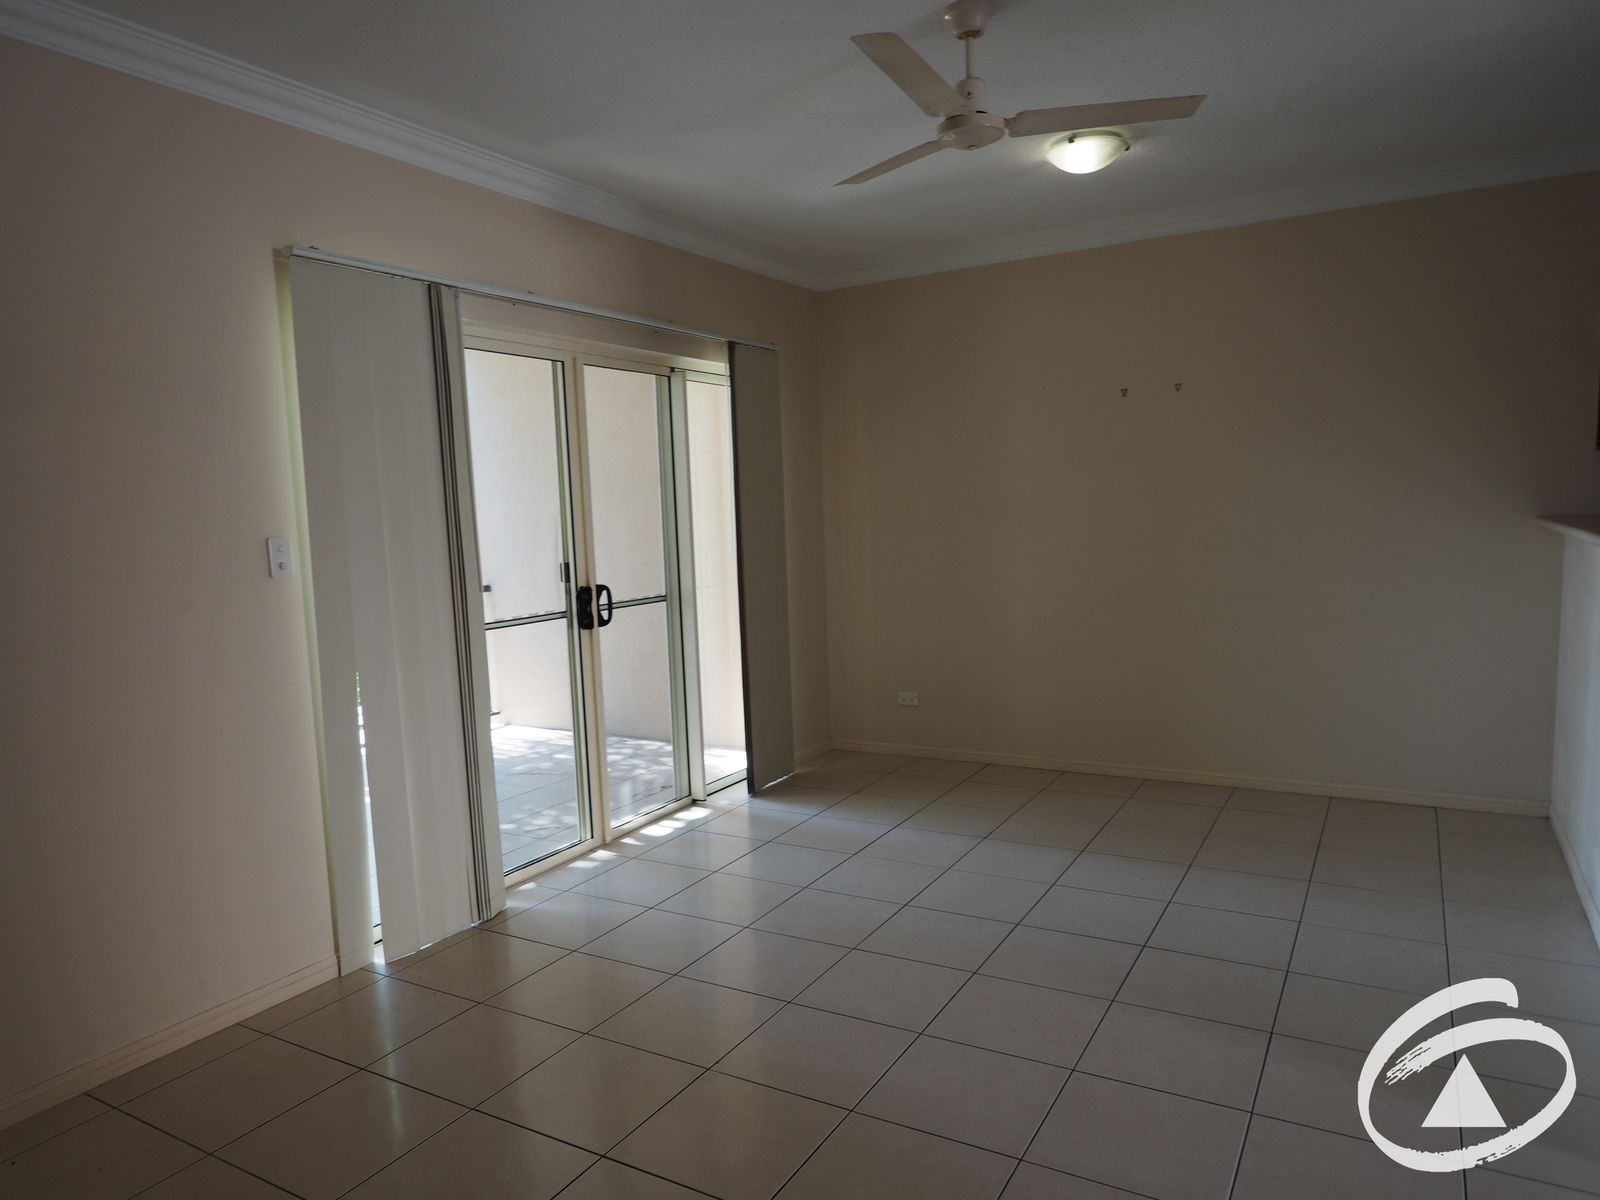 203/4 Grantala Street, Manoora, QLD 4870